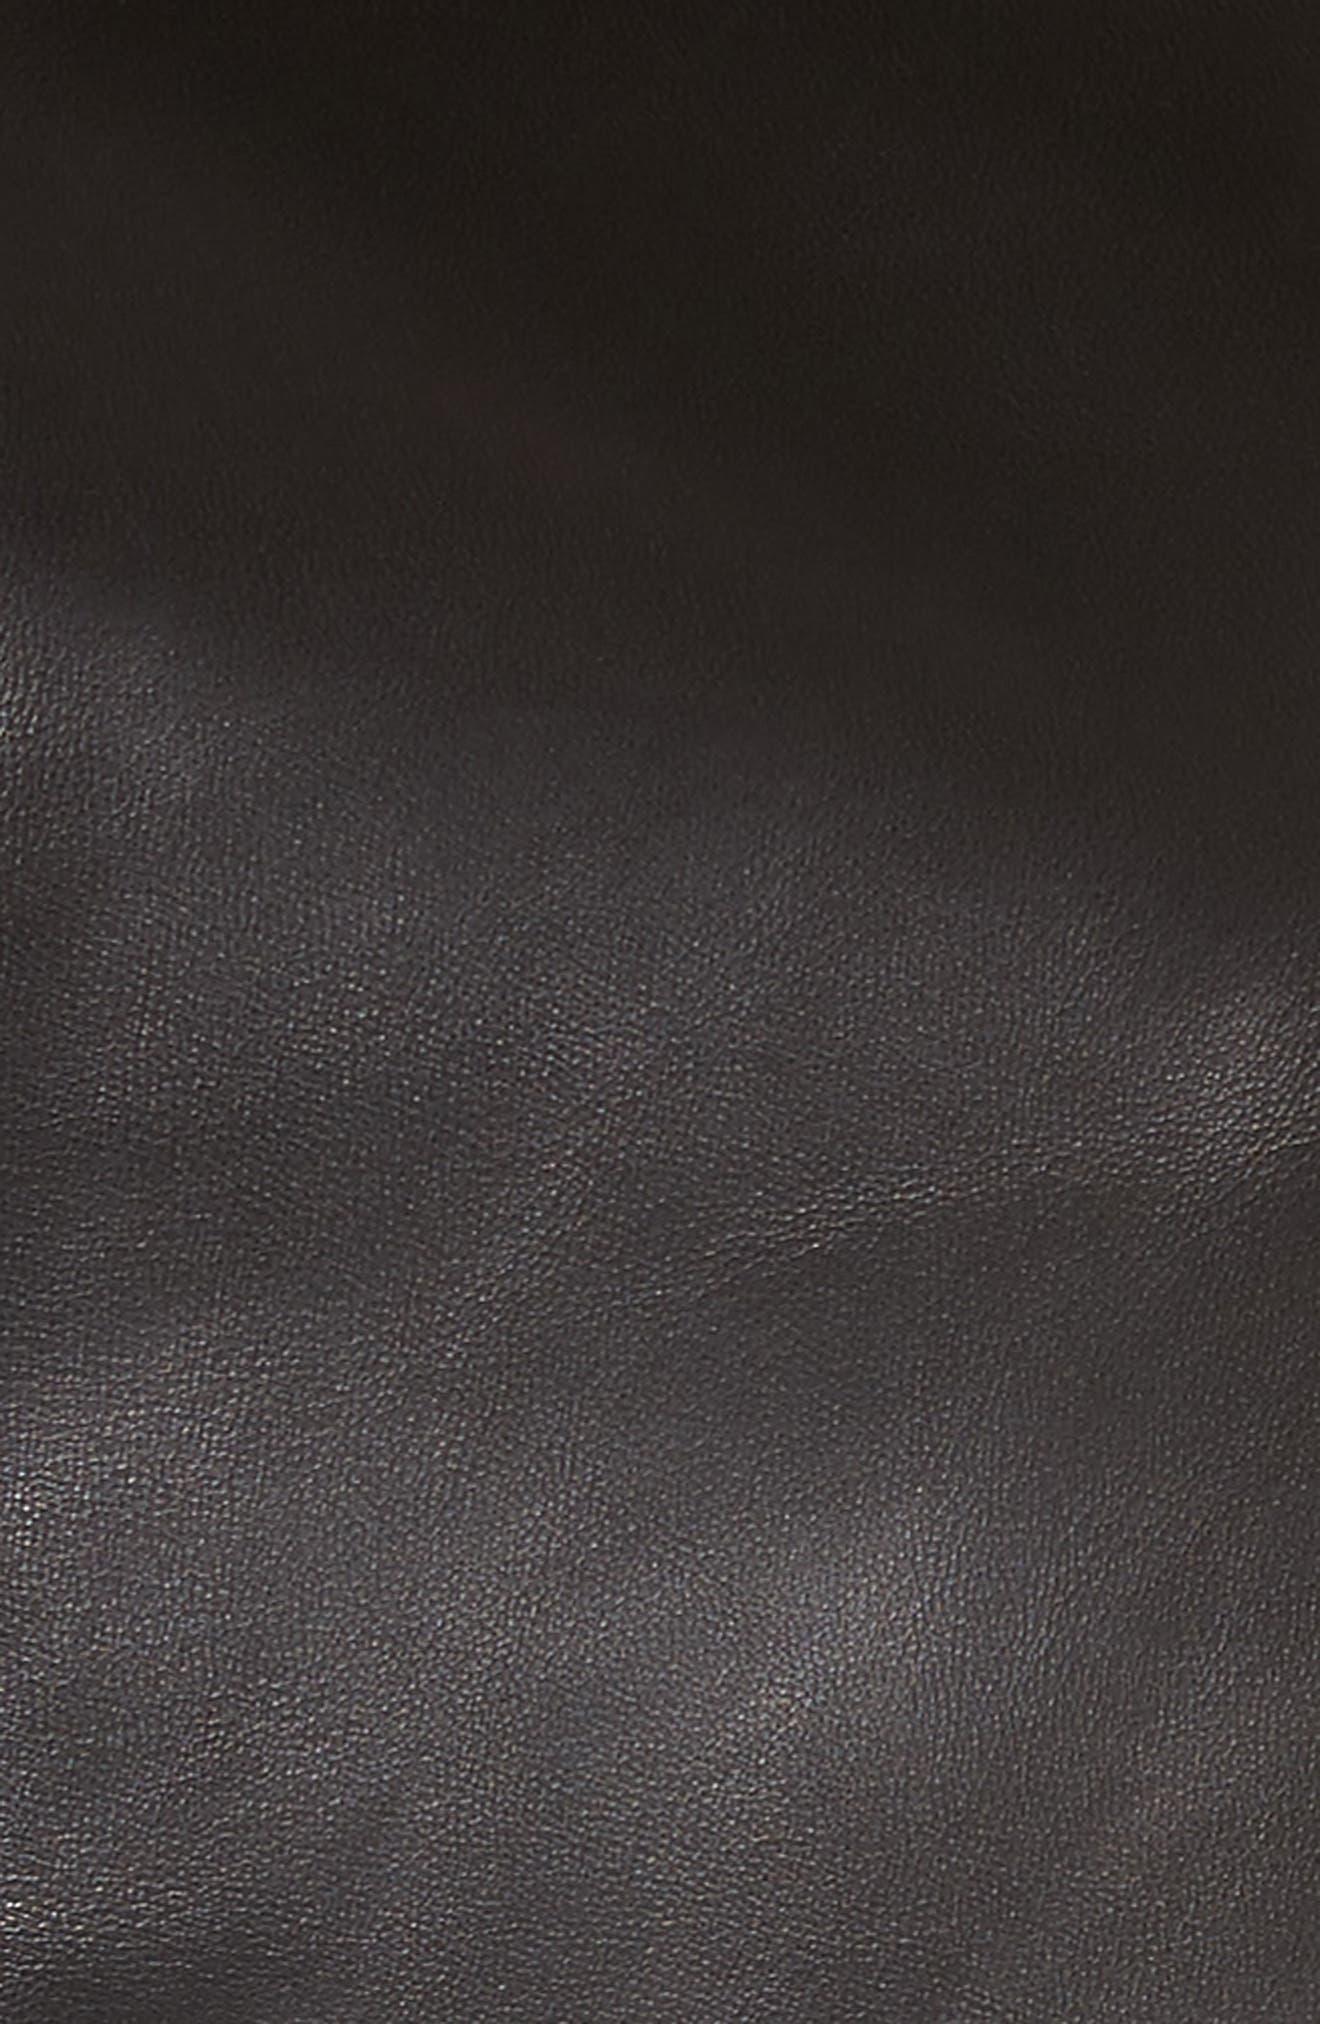 Hook Detail Lambskin Leather Jacket,                             Alternate thumbnail 6, color,                             001